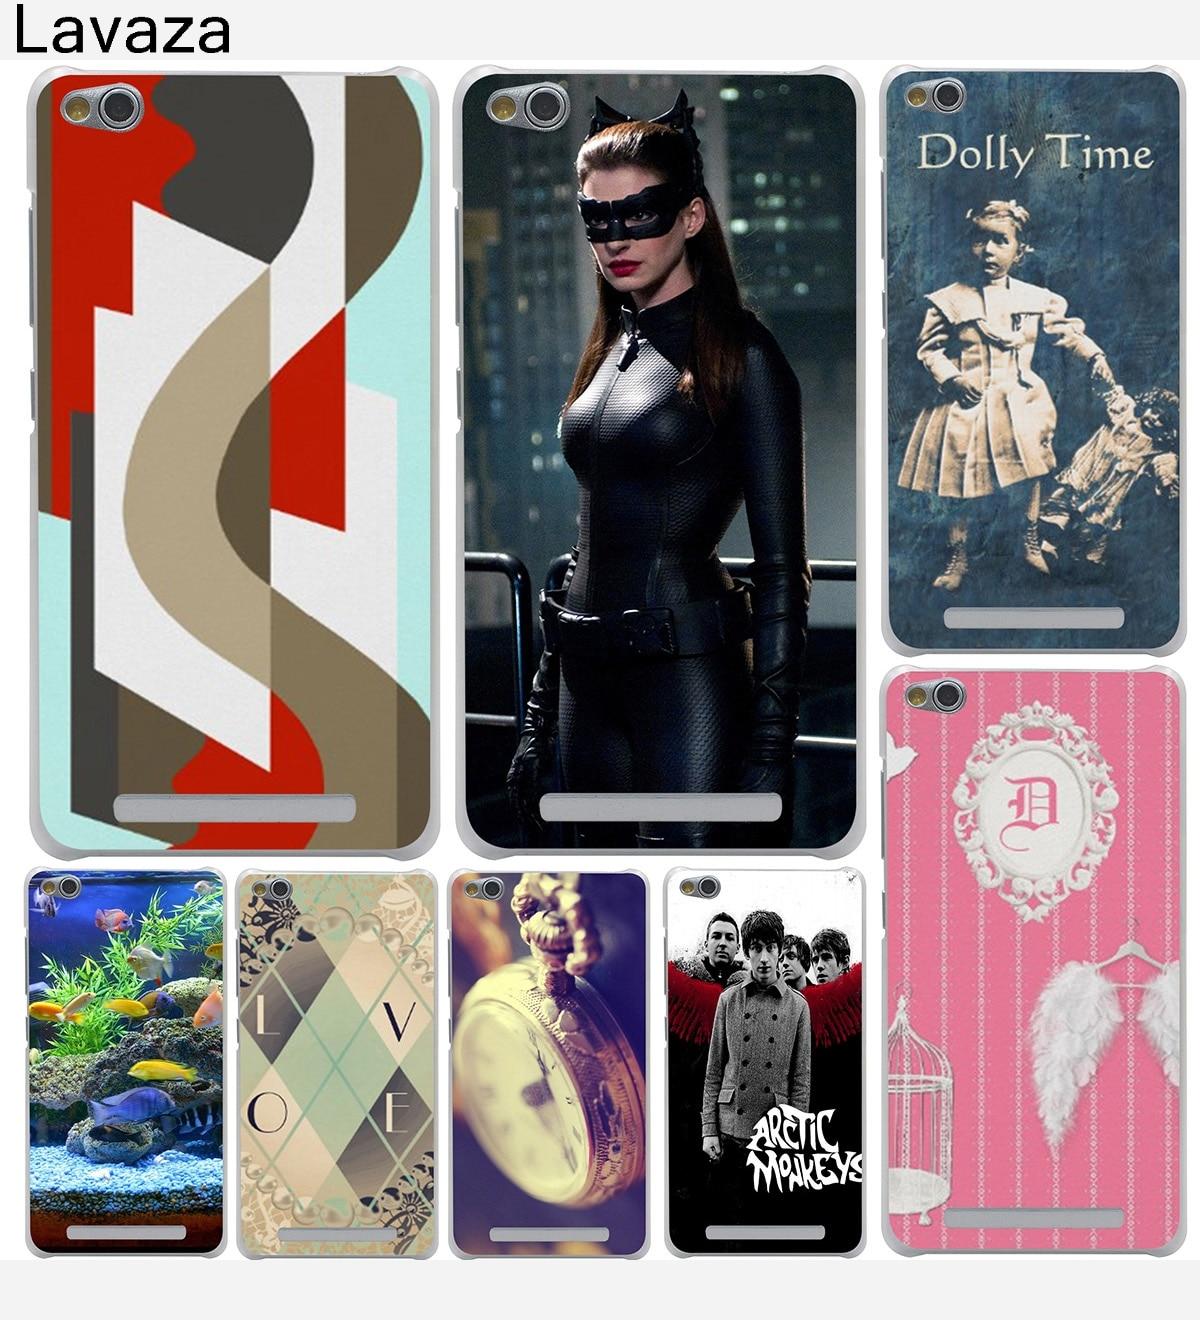 Lavaza Anne Hathaway Hard Case For Xiaomi Redmi 4x Mi A1 6 5 5x 5s Slim Matte Gea Baby Skin 3s 3pro Pro Hardcase Plus Note 5a 2 3 4a 4 Prime Mi5x Mi6 Mi5s